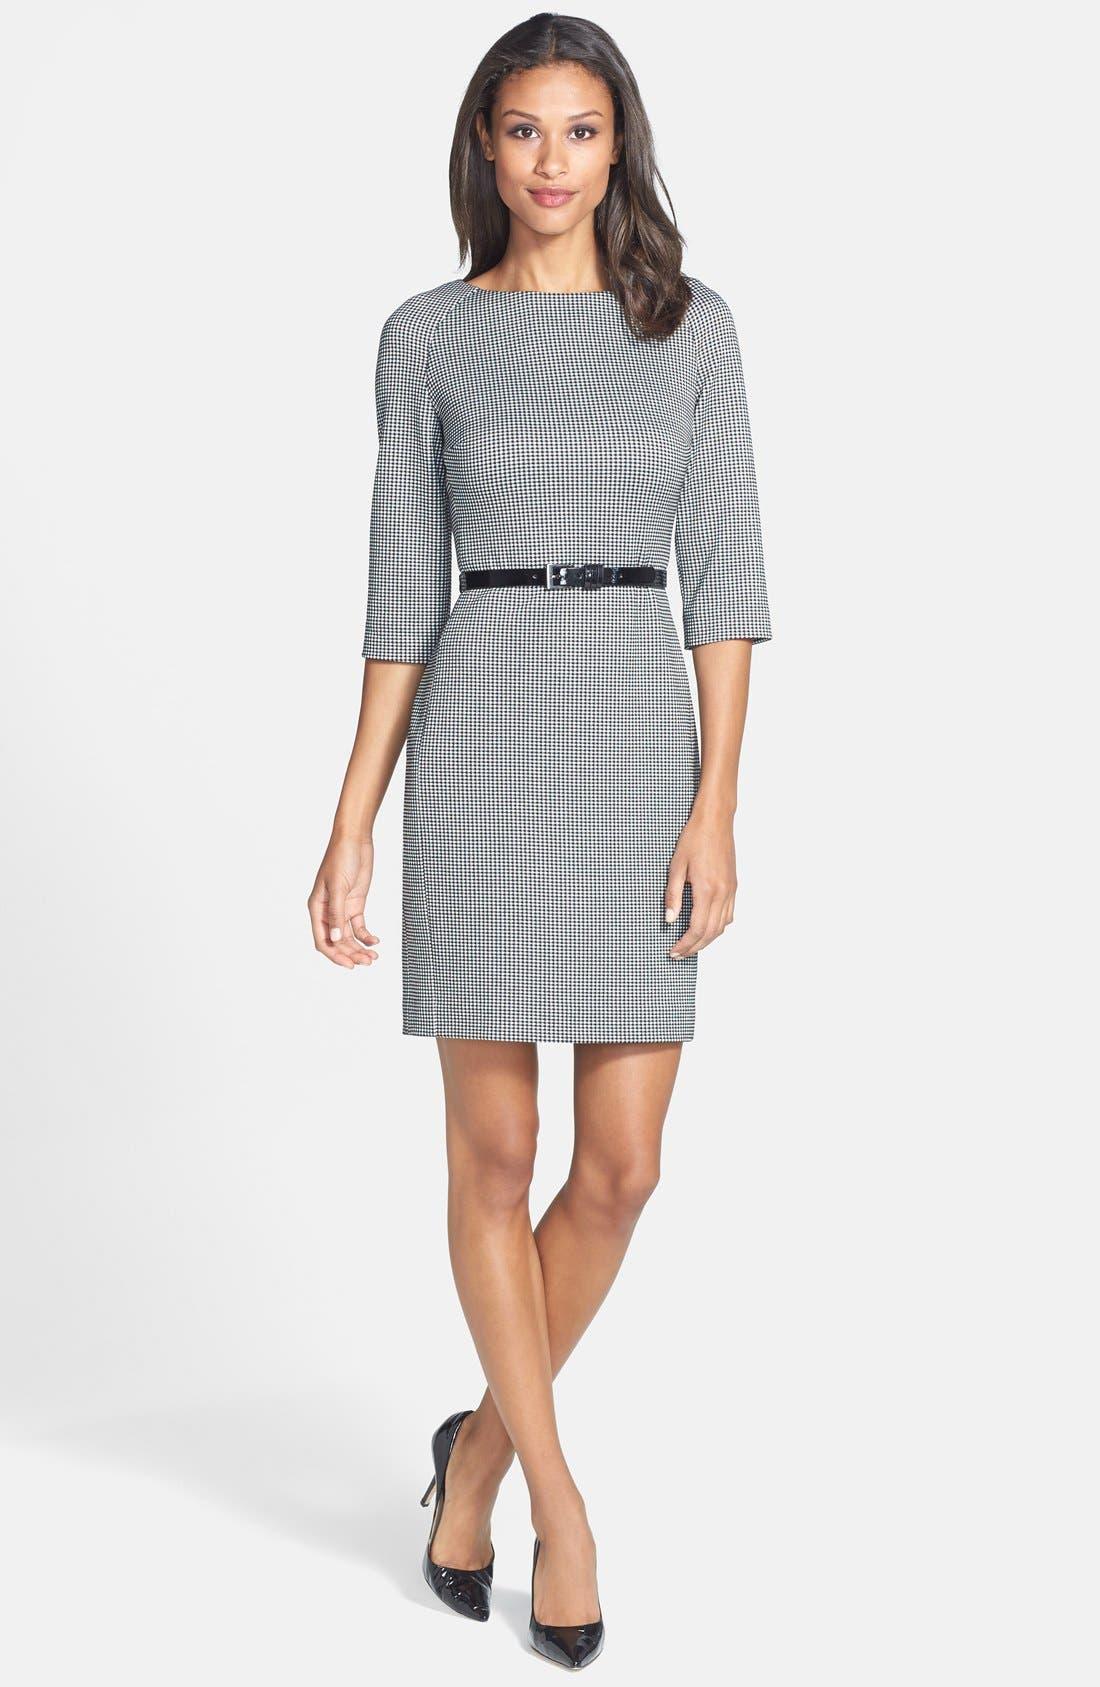 Alternate Image 1 Selected - Anne Klein Gingham Ponte Sheath Dress (Regular & Petite)